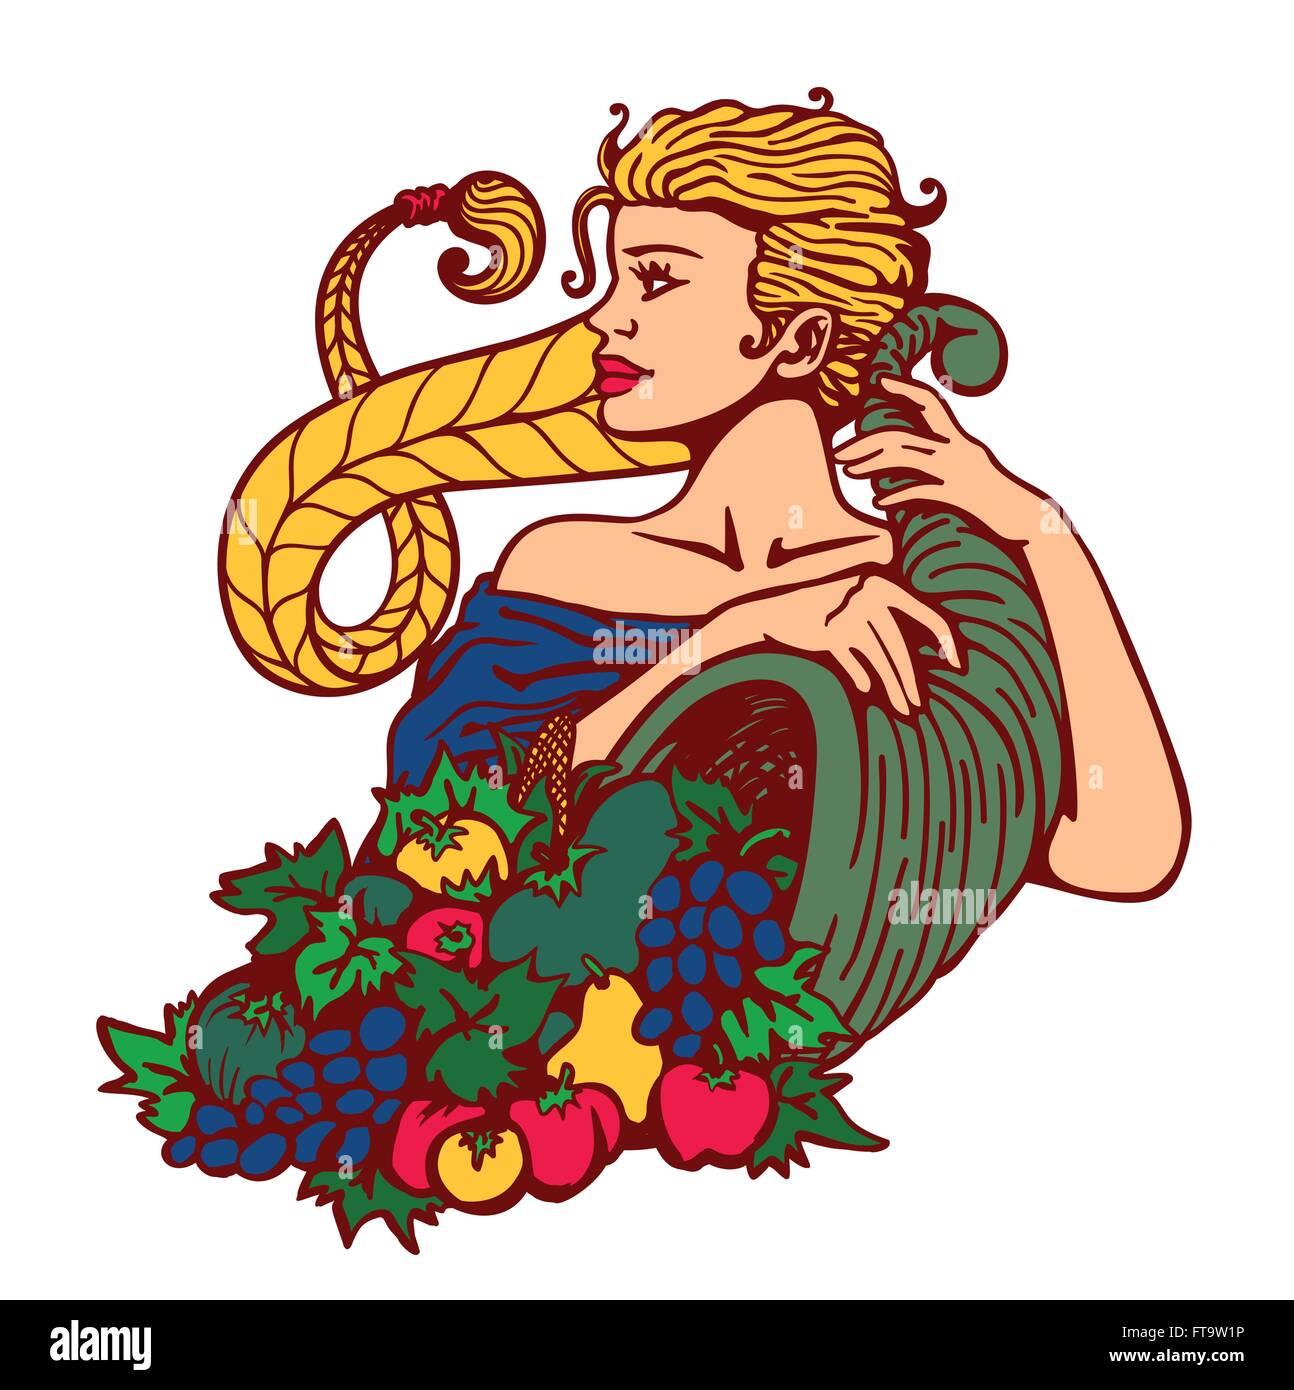 Girl with blond hair in plait holding cornucopia horn of plenty full of fruits and vegetables, autumn season harvest - Stock Image